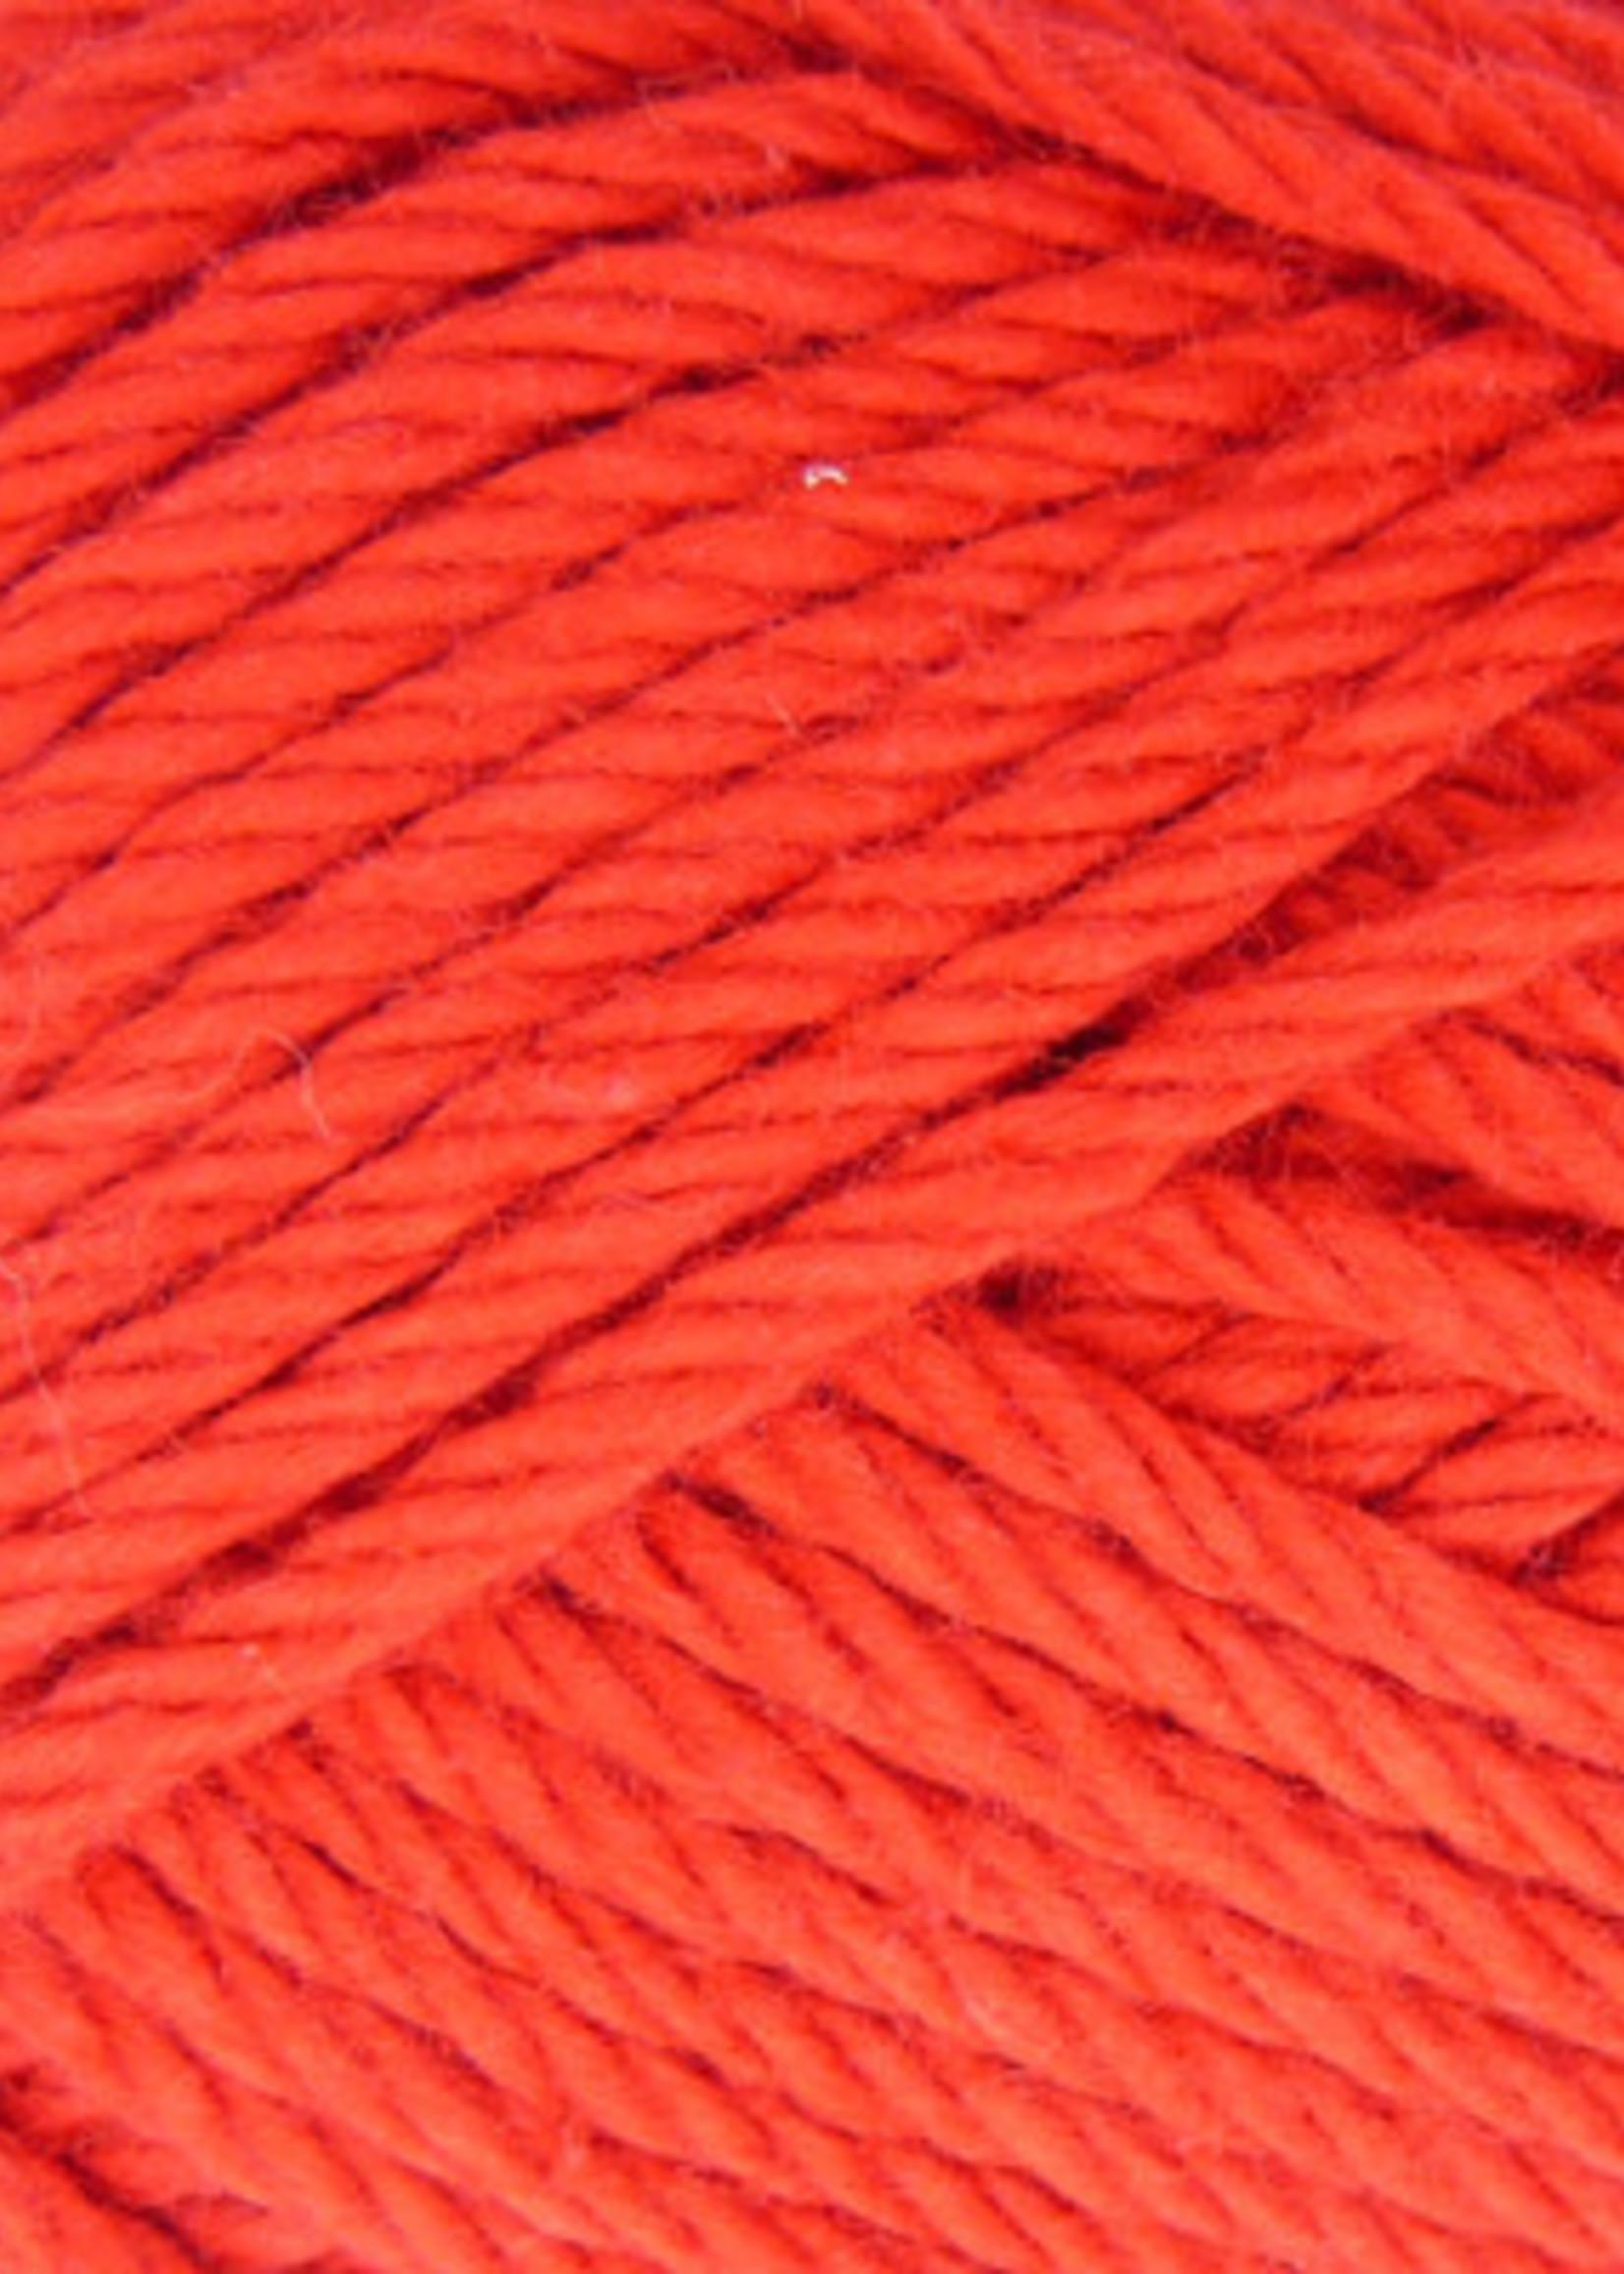 Estelle Yarns Sudz Cotton #53940 Red